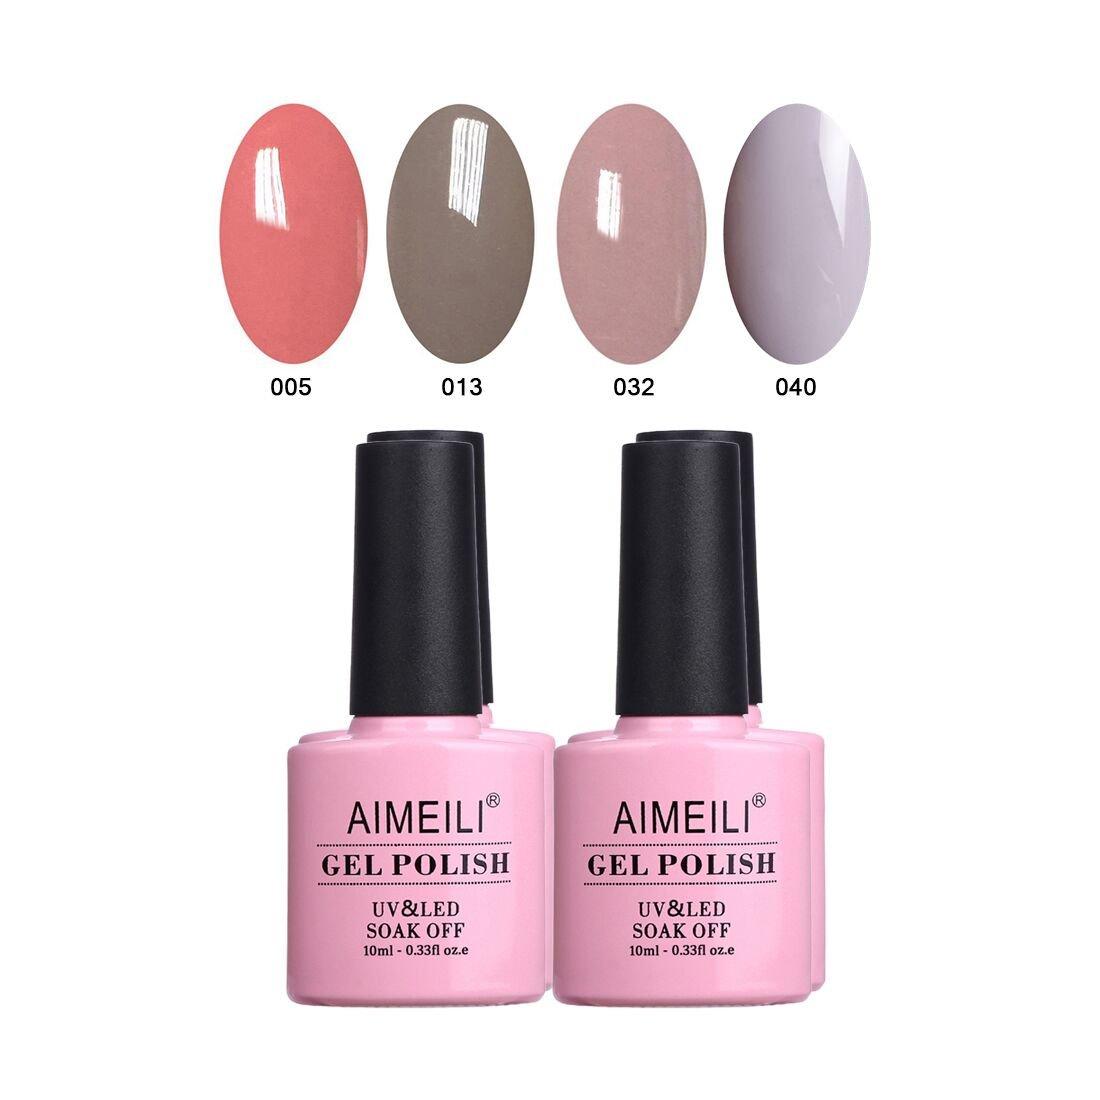 AIMEILI Esmalte Semipermanente Para Uñas Soak Off UV LED Uñas De Gel Kit de Manicura Color Combinado/Color De La Mezcla/Multicolur Set 4 X 10ml - Set 18